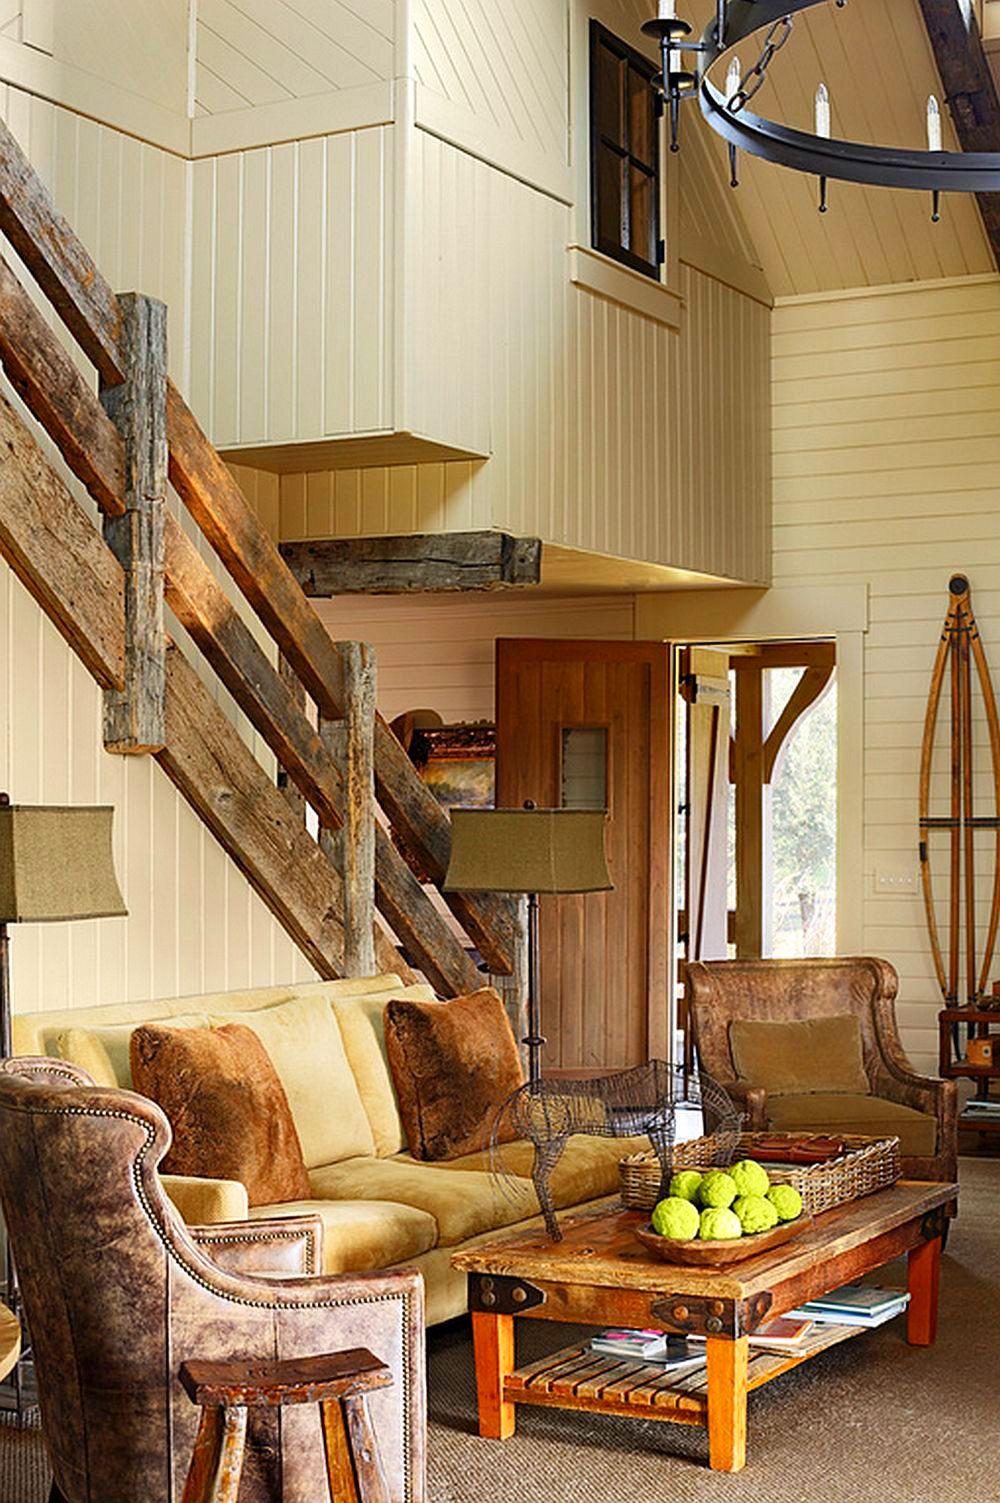 adelaparvu.com despre casa rustica cu veranda Alabama, casa rustica SUA, Marsh Residence, arhitecti Dungan Nequette Architecs (6)